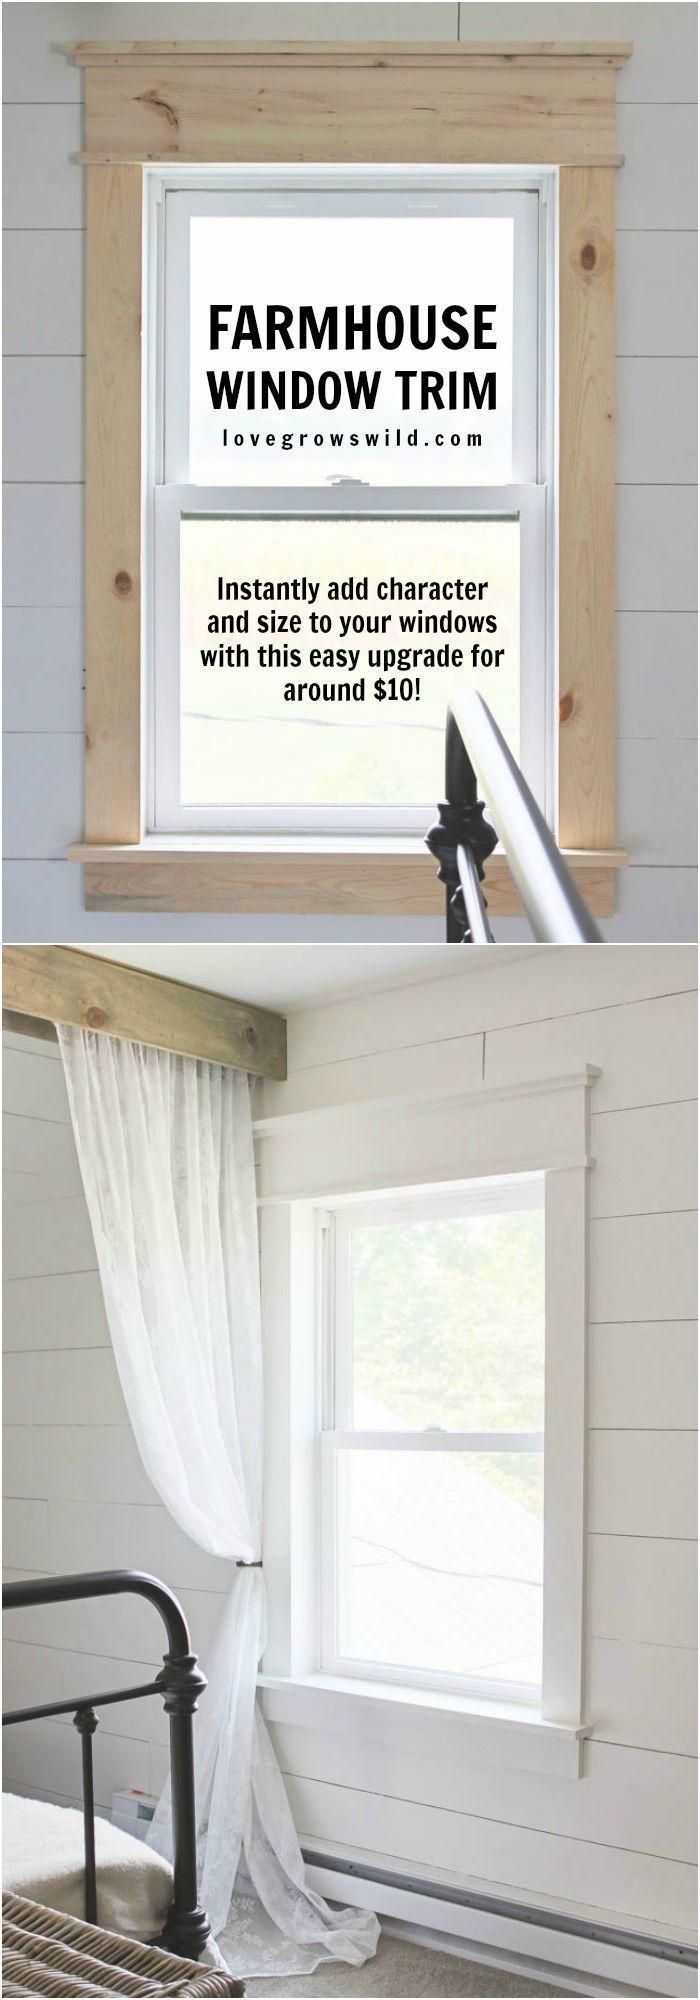 Exterior window cornice ideas - Farmhouse Window Trim